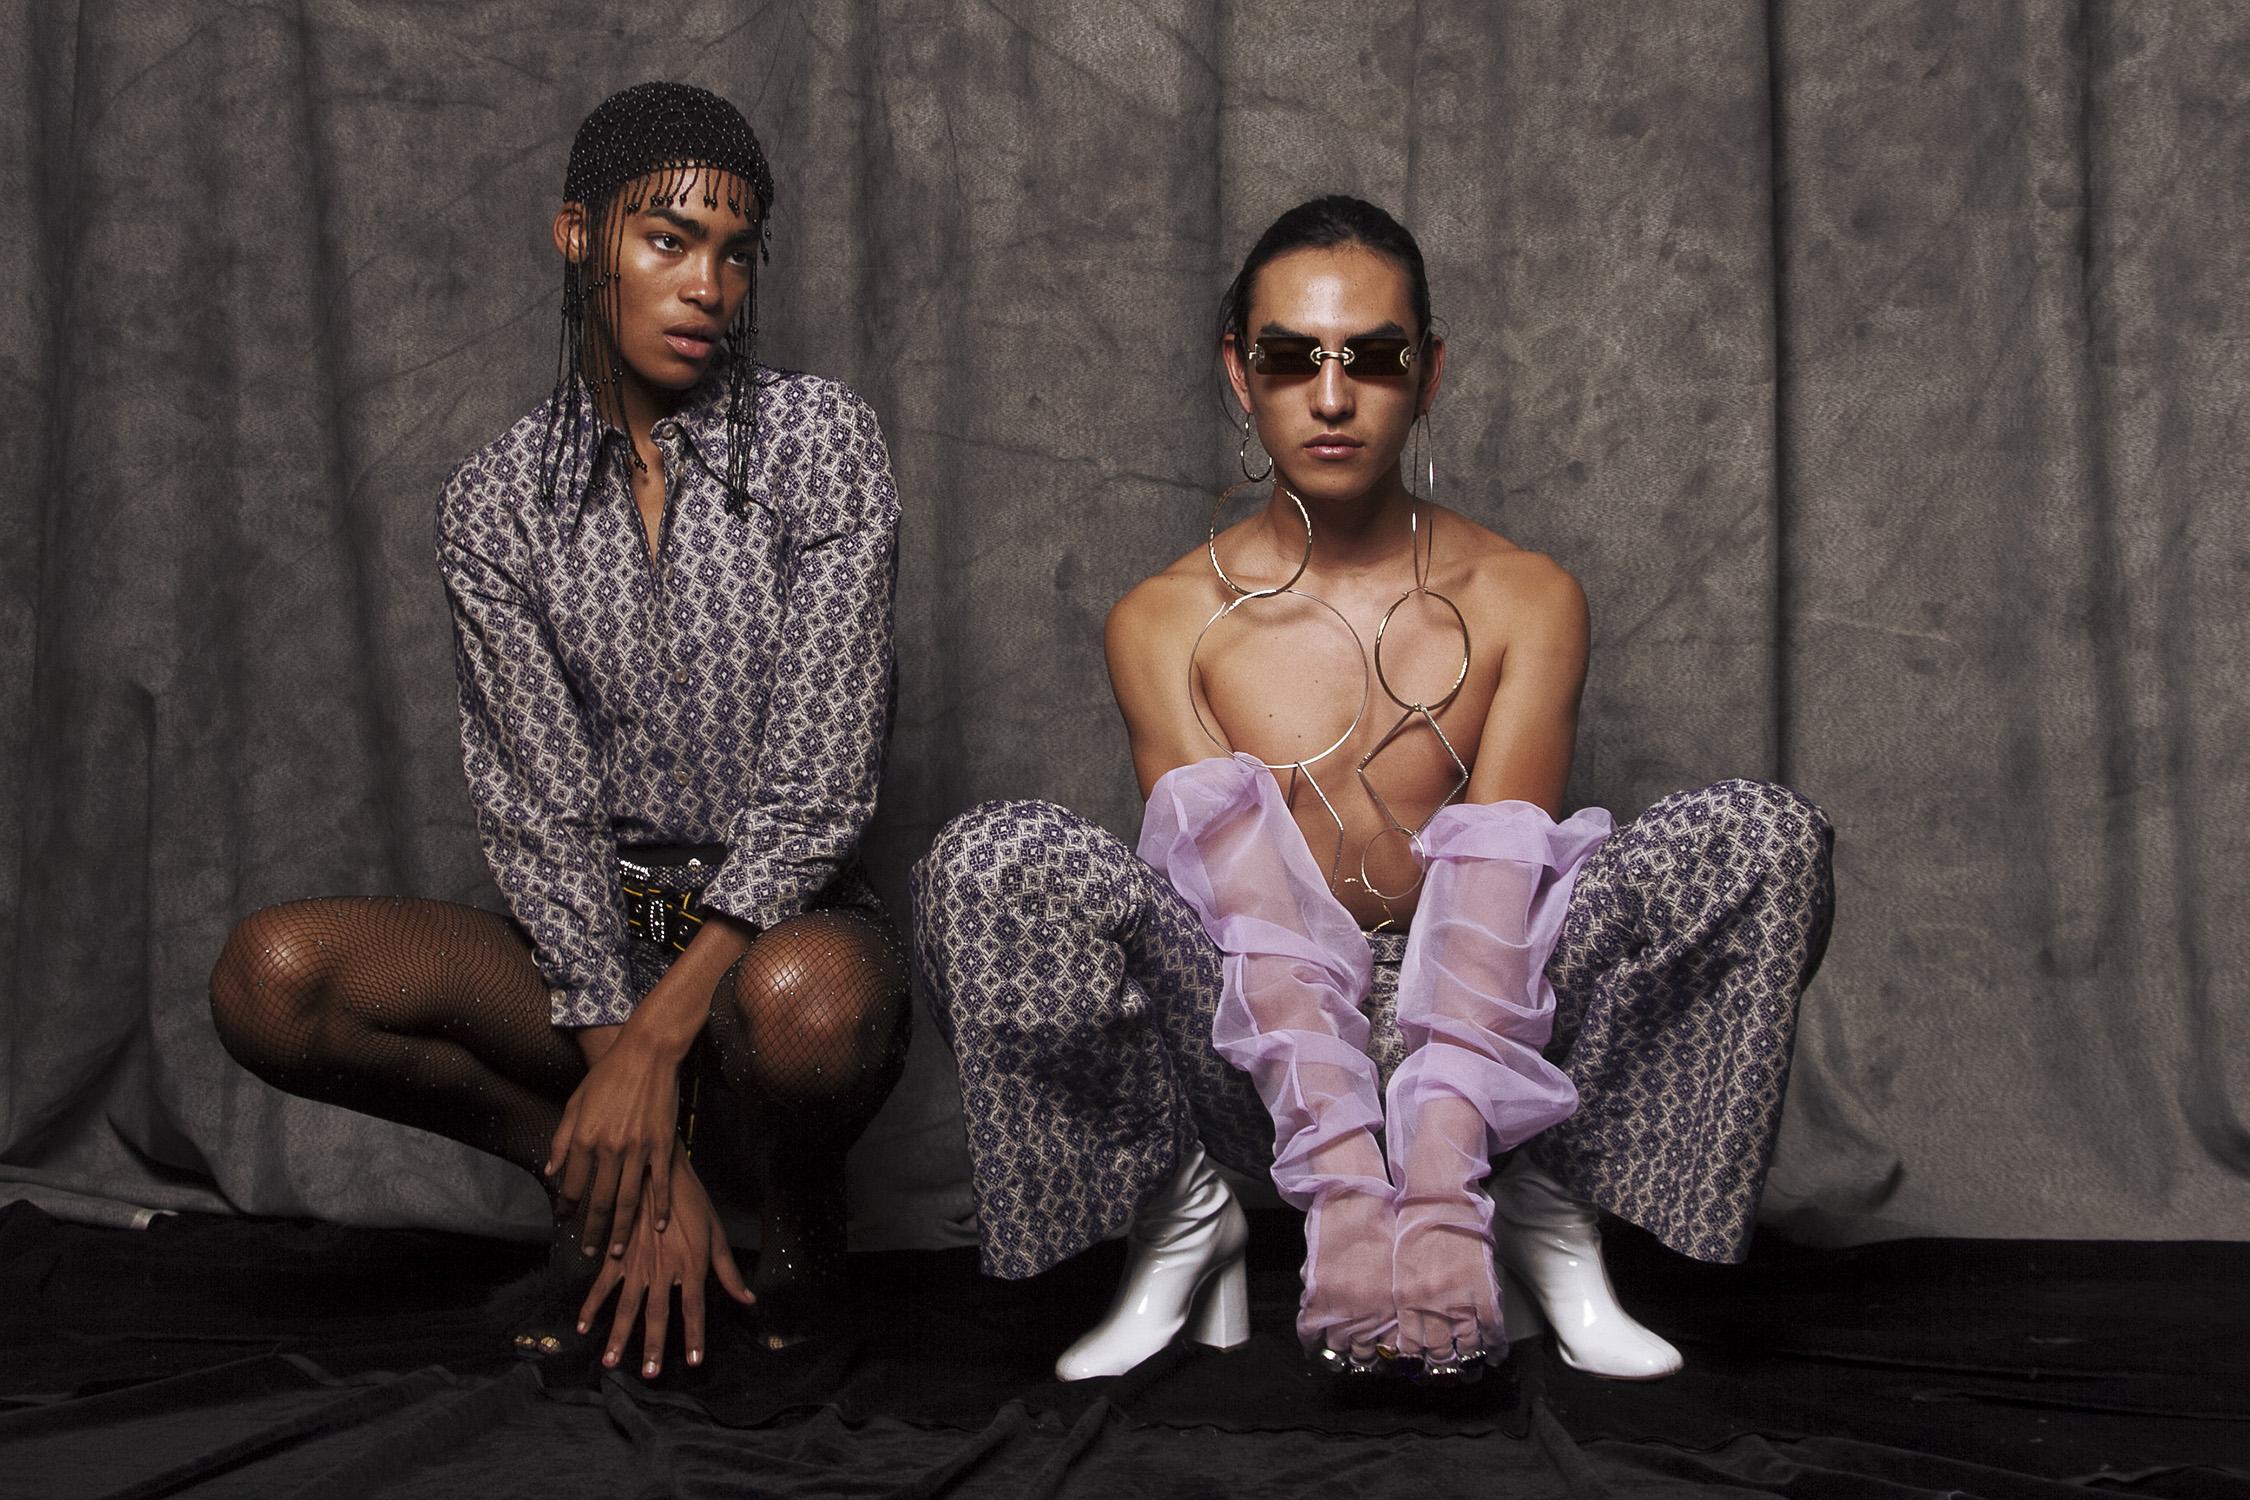 Pantalón  Gucci,  botas  Glitter for dinner,  aretes  f21,  lentes  Boy London,  guantes  Eva Urias.  Headpiece vintage  camisa  Gucci,  medias  Zara,  zapatos  Oysho,  cinturón  nda.